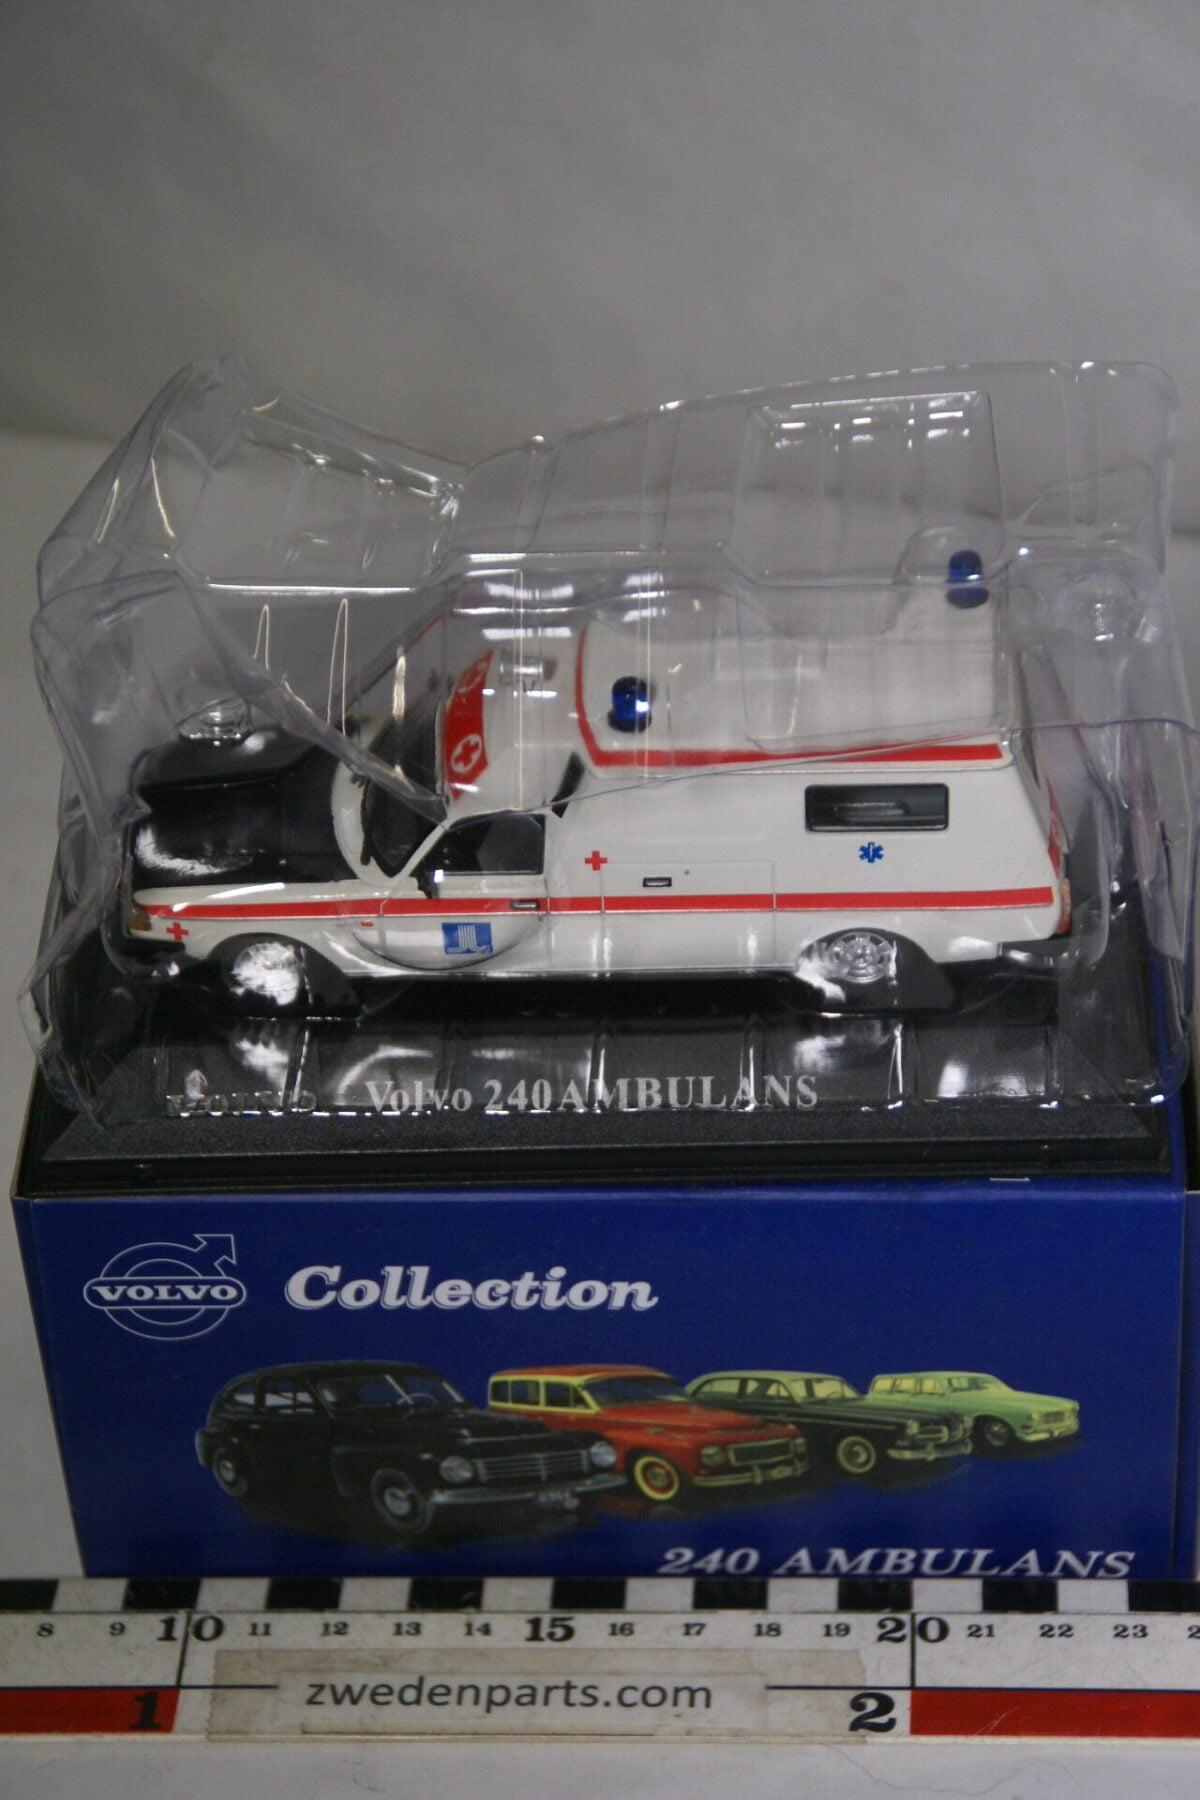 DSC00547 miniatuur Volvo 240 245 ambulance 1op43 Atlas 56 nieuw in originele verpakking-537a4a20